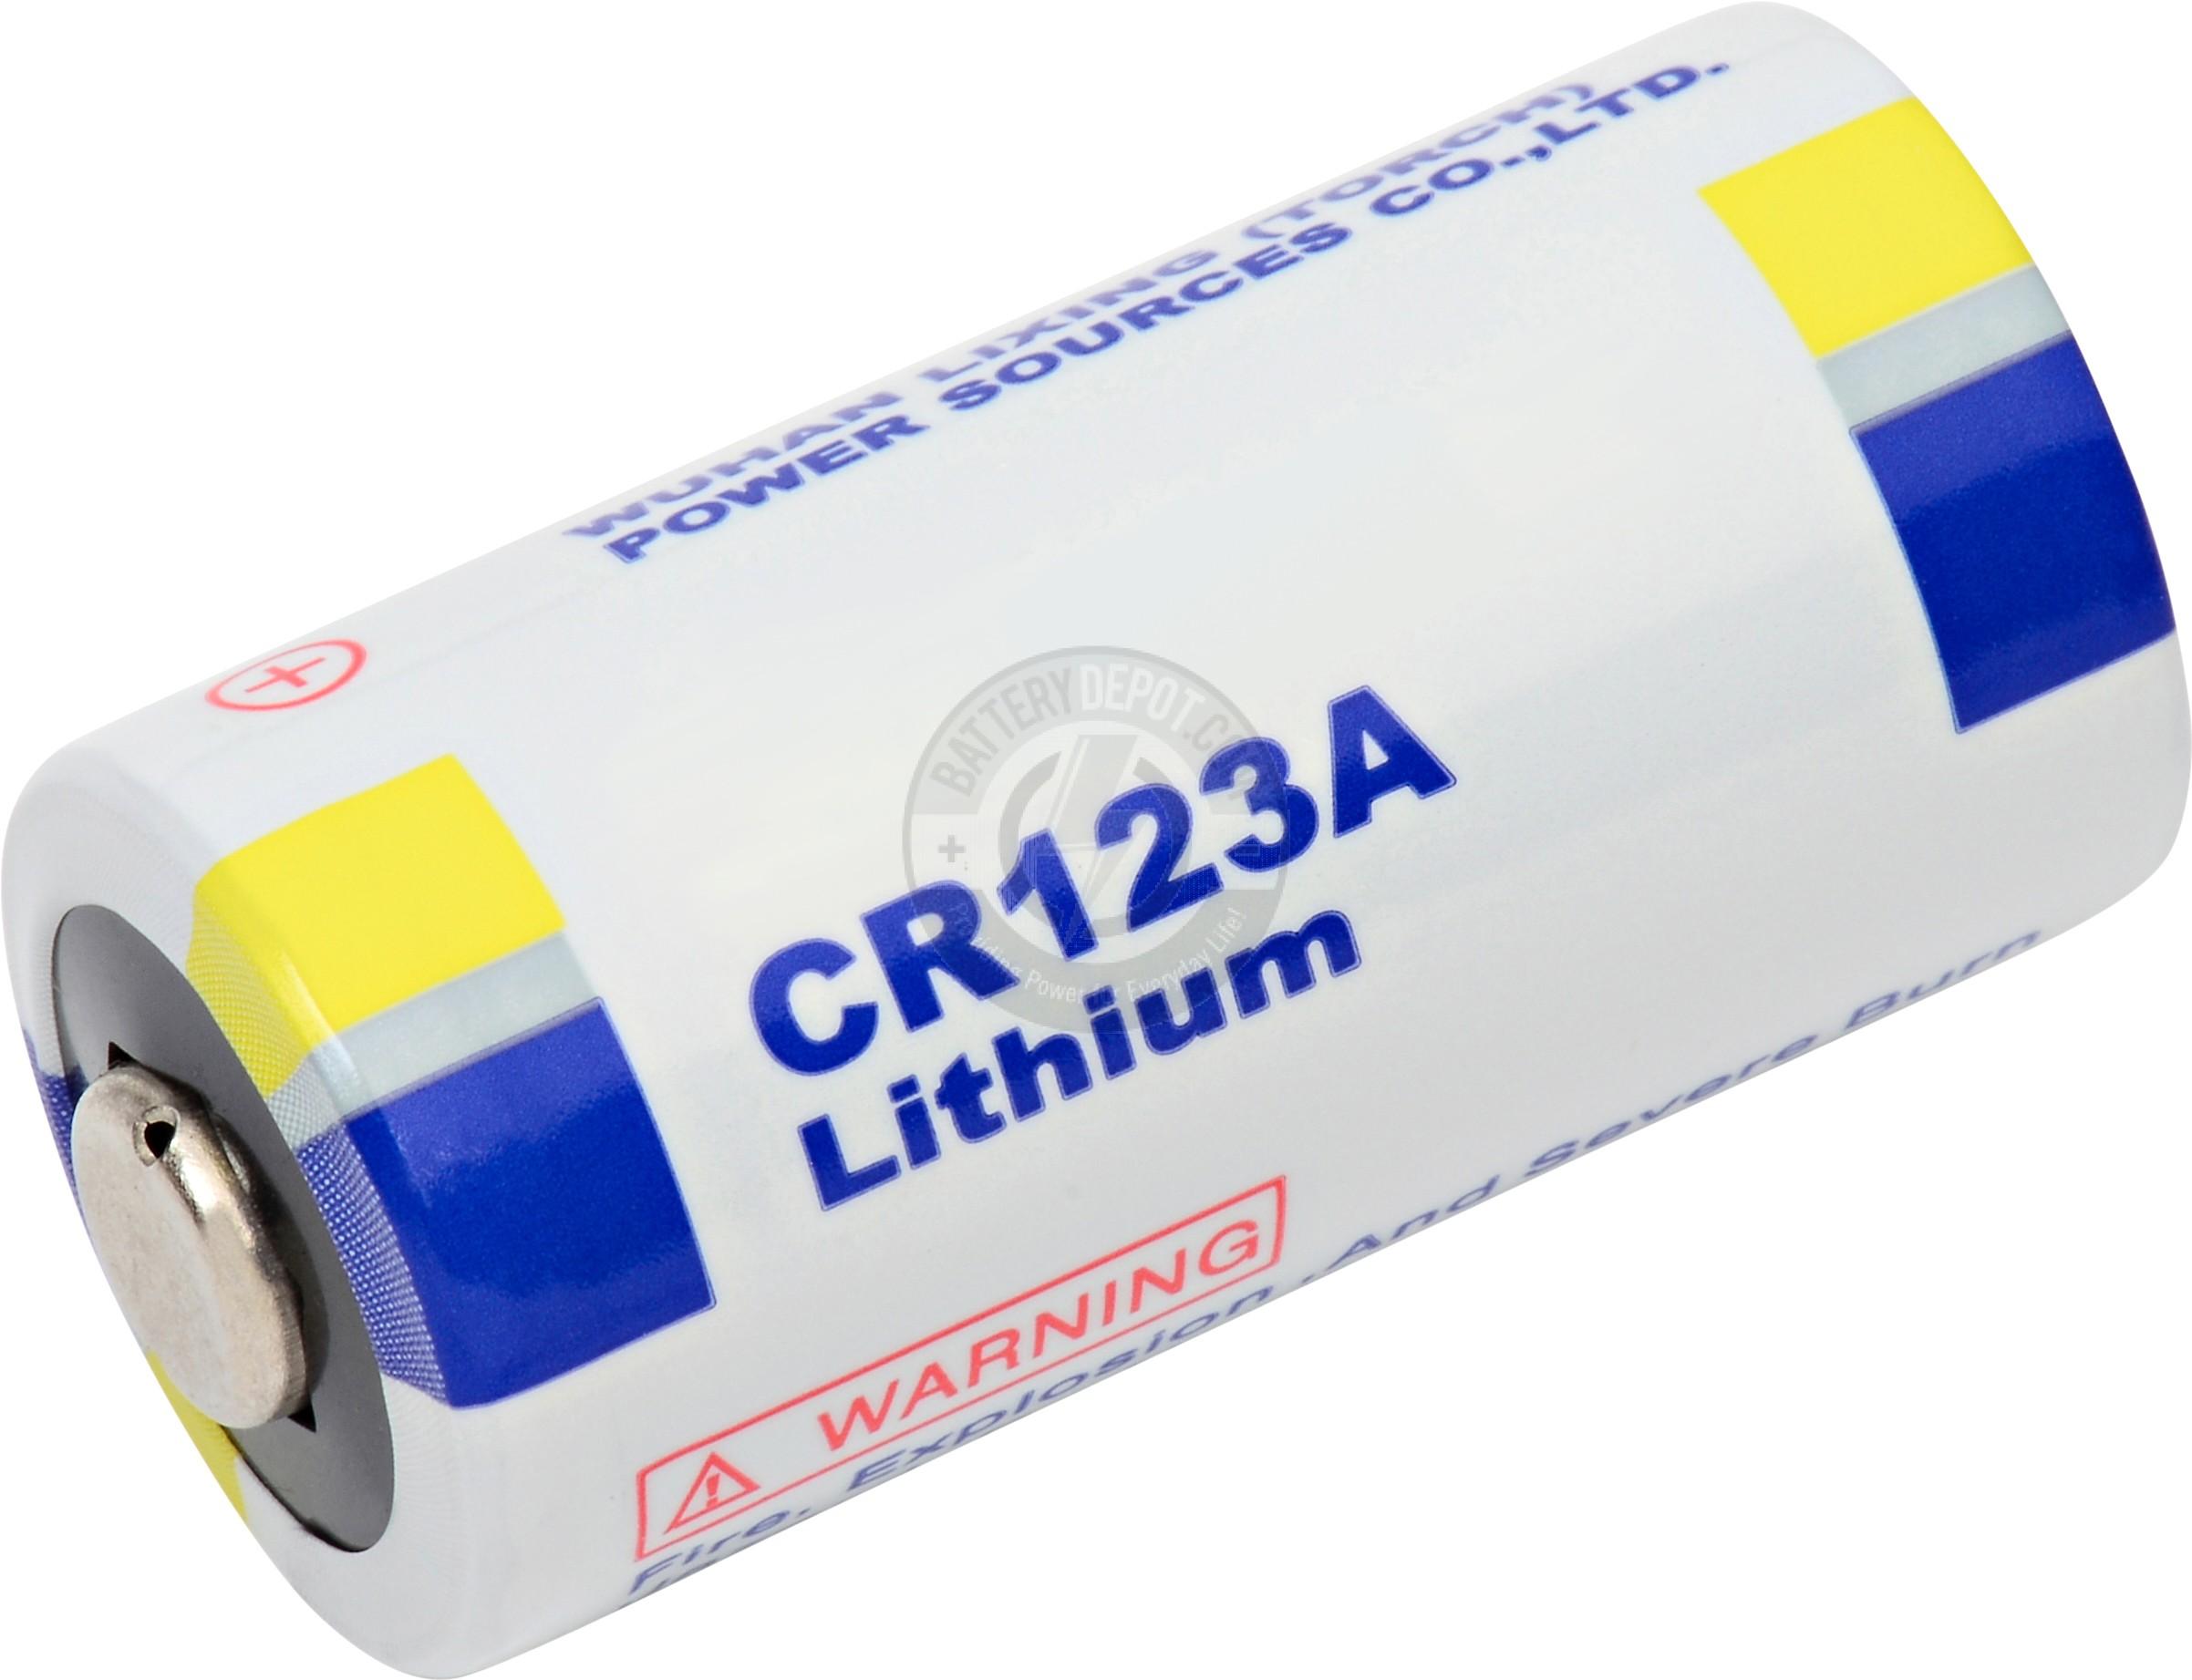 CR123